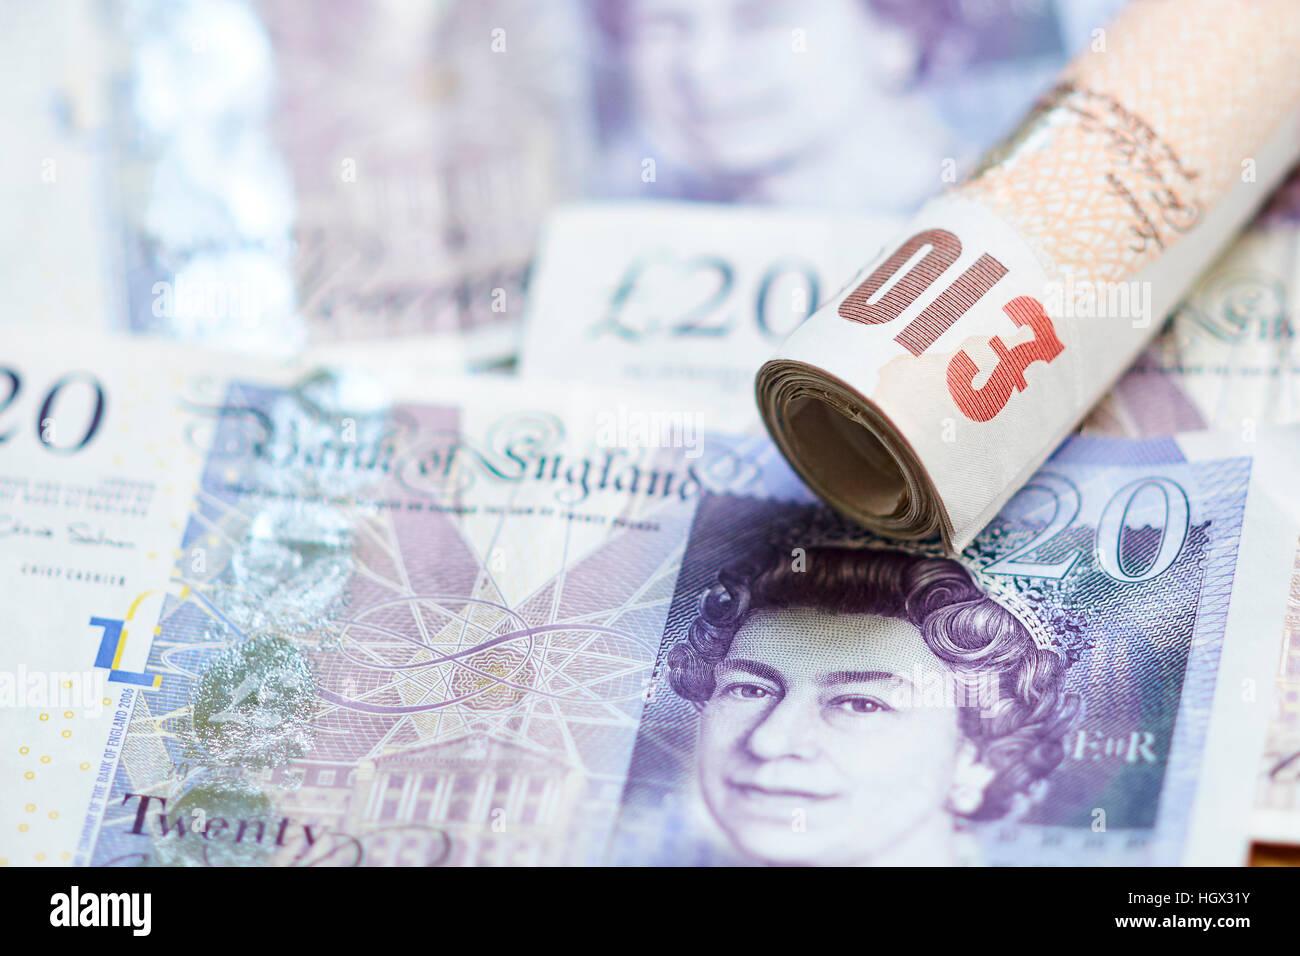 British Twenty and ten pound notes - Stock Image